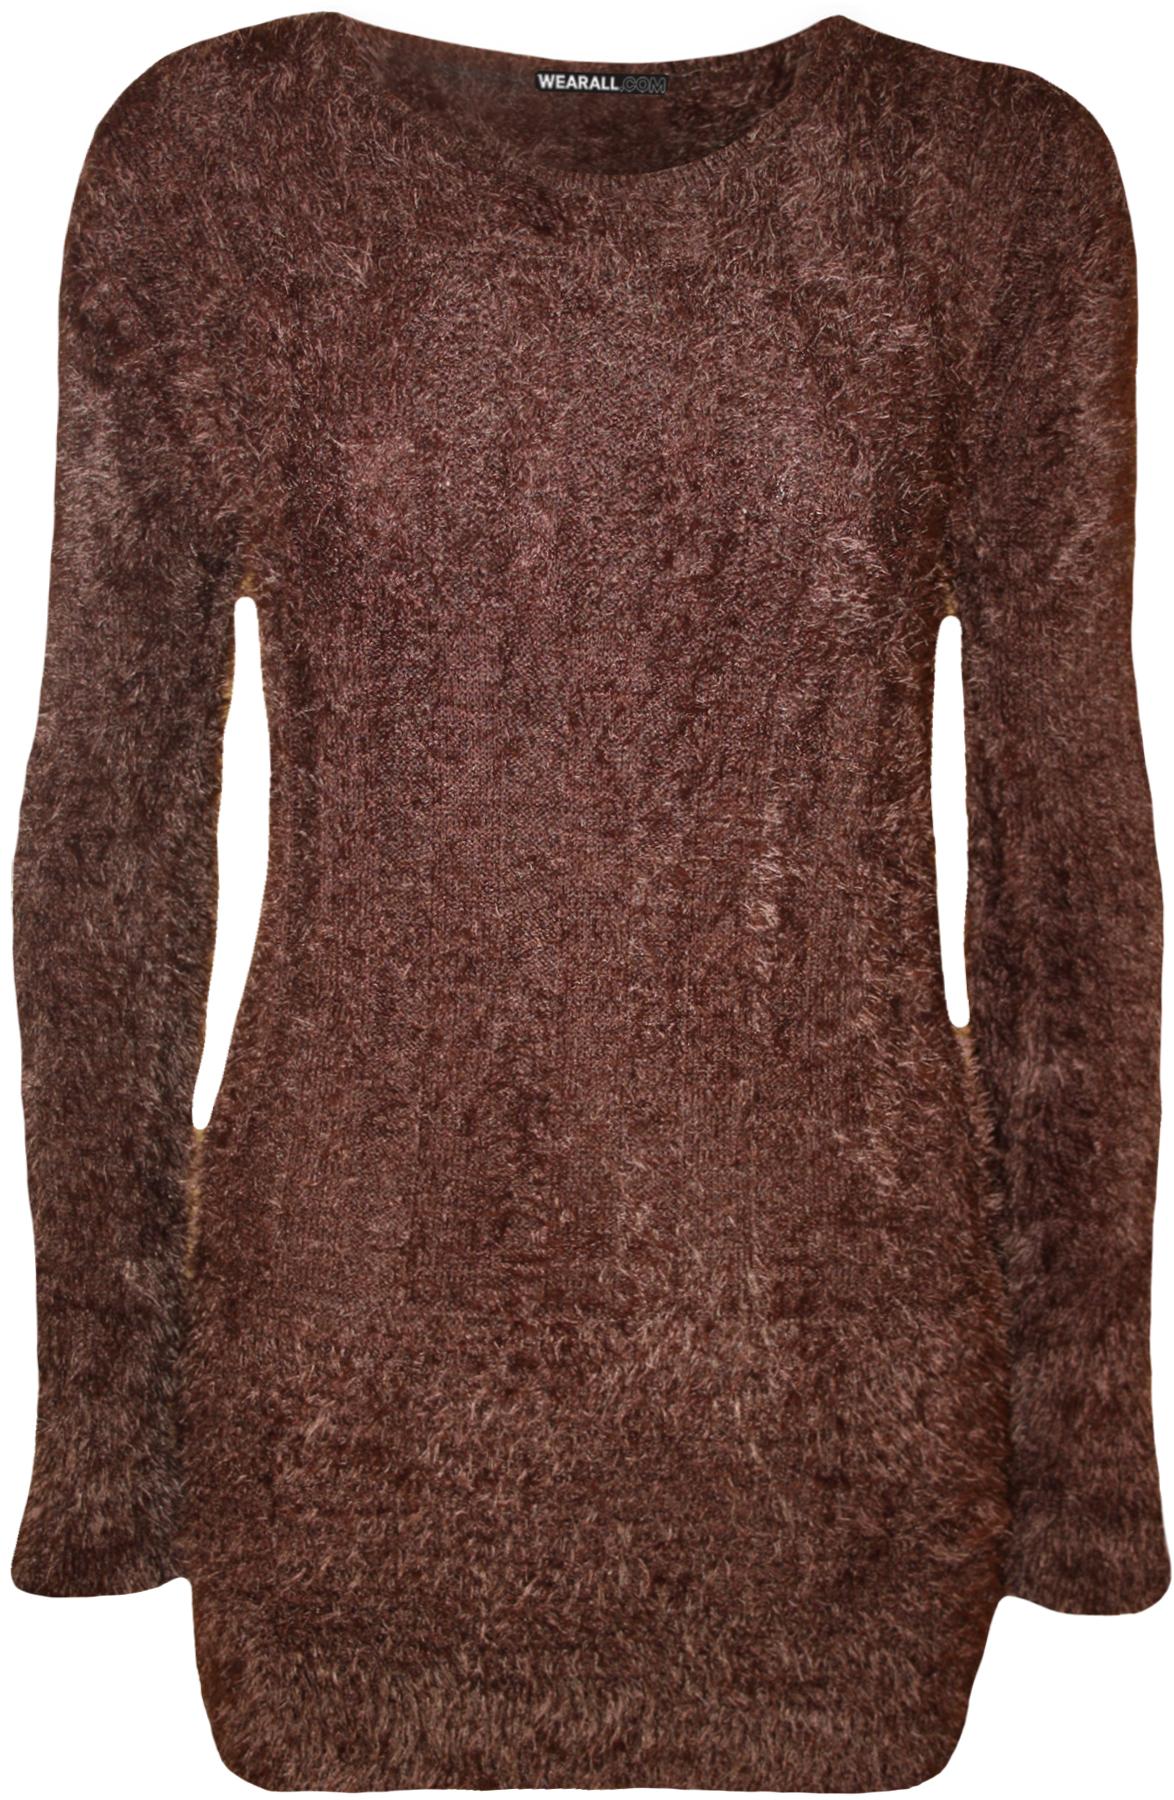 Knitting Pattern Plain Jumper : New Womens Plain Fluffy Long Sleeve Top Sweater Ladies Soft Knitted Jumper 8-...